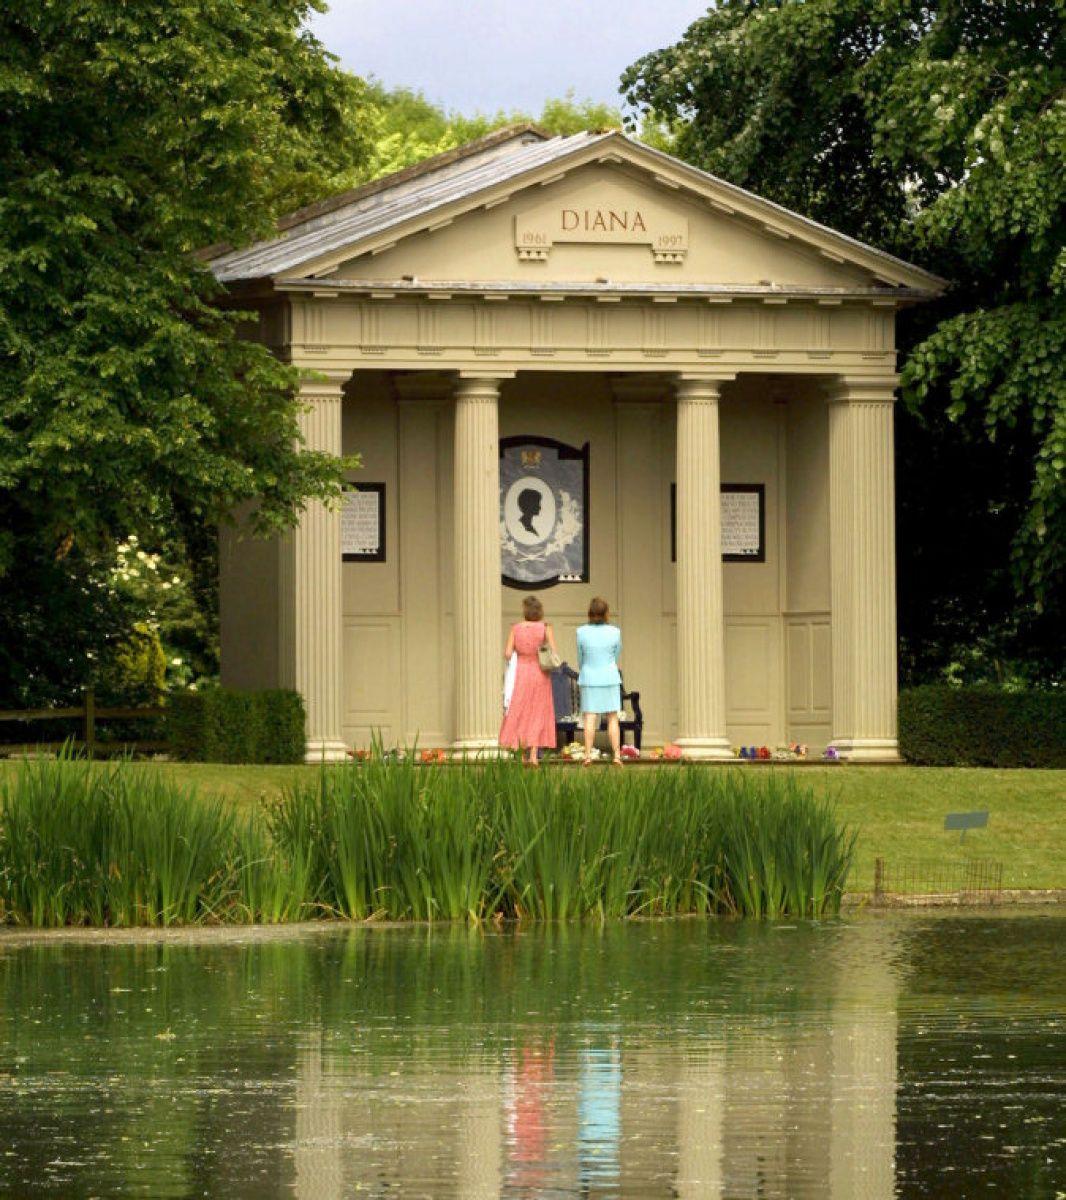 William and Kate visit Princess Diana's grave Princess